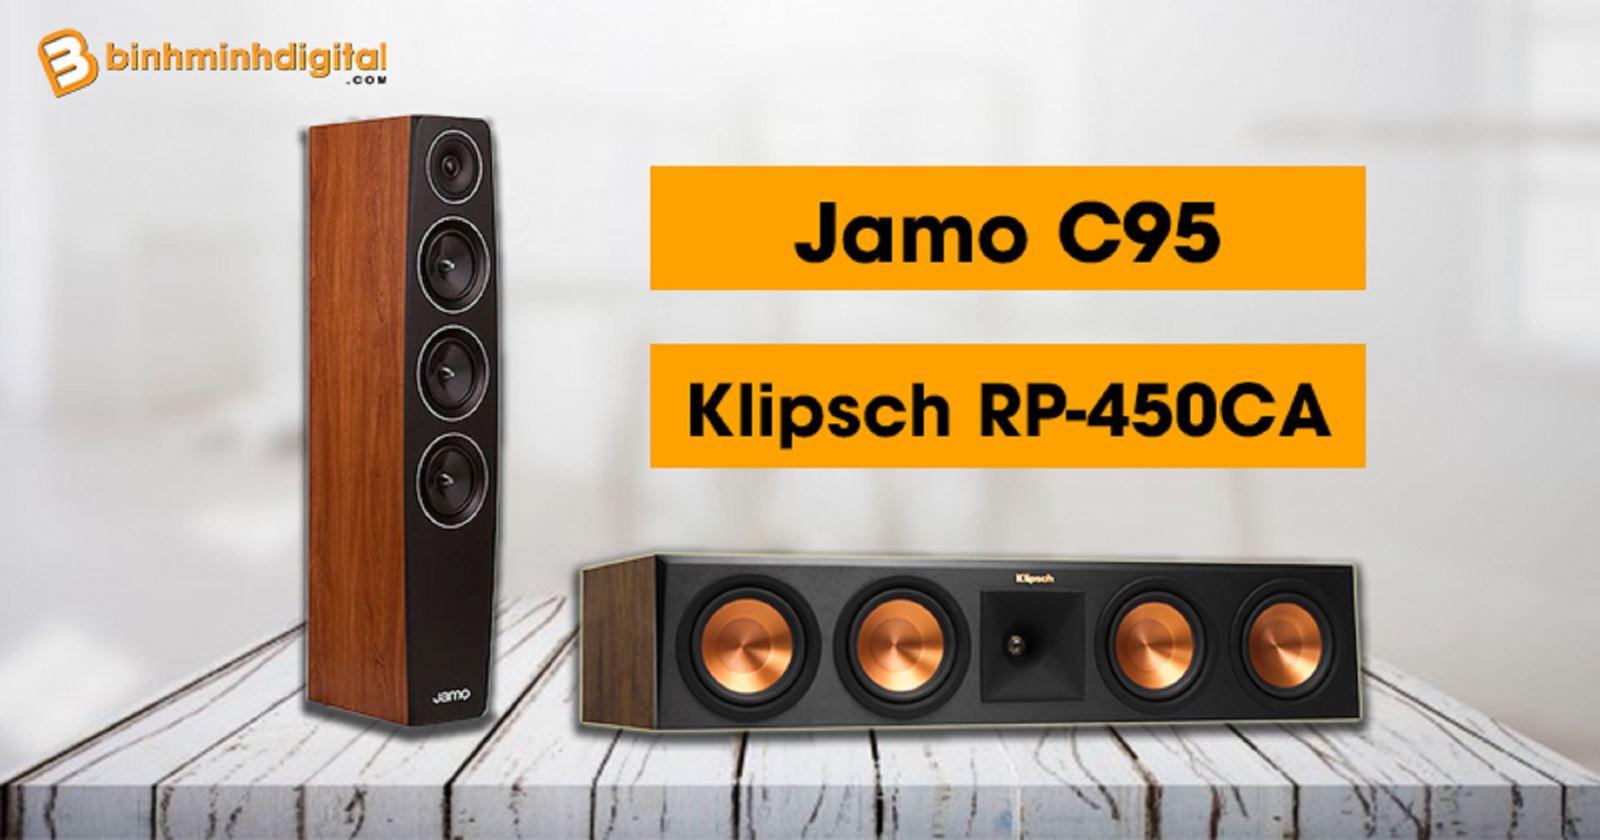 So sánh LoaJamo C95 với Klipsch RP-450CA